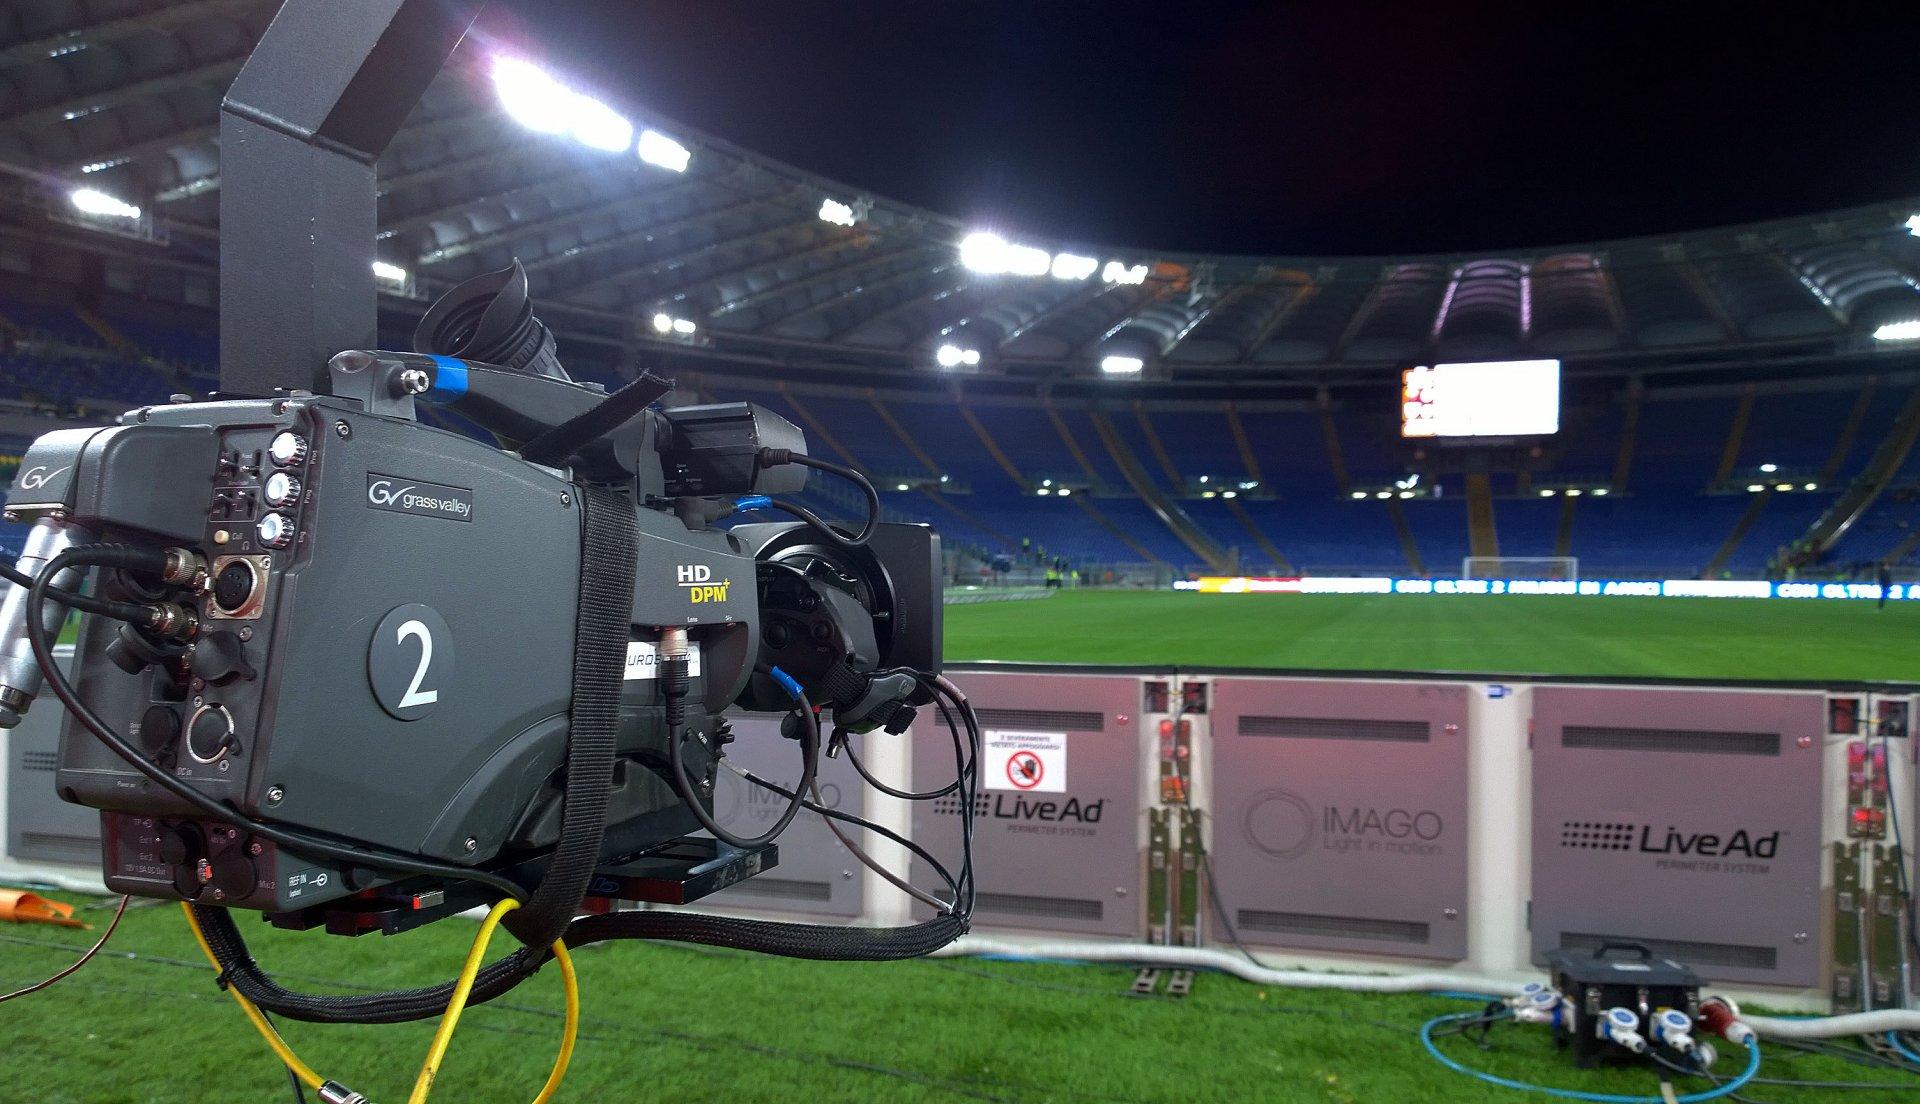 Serie A 2020 - 2021, le 20 partite scelte come big-match da Sky Sport e DAZN